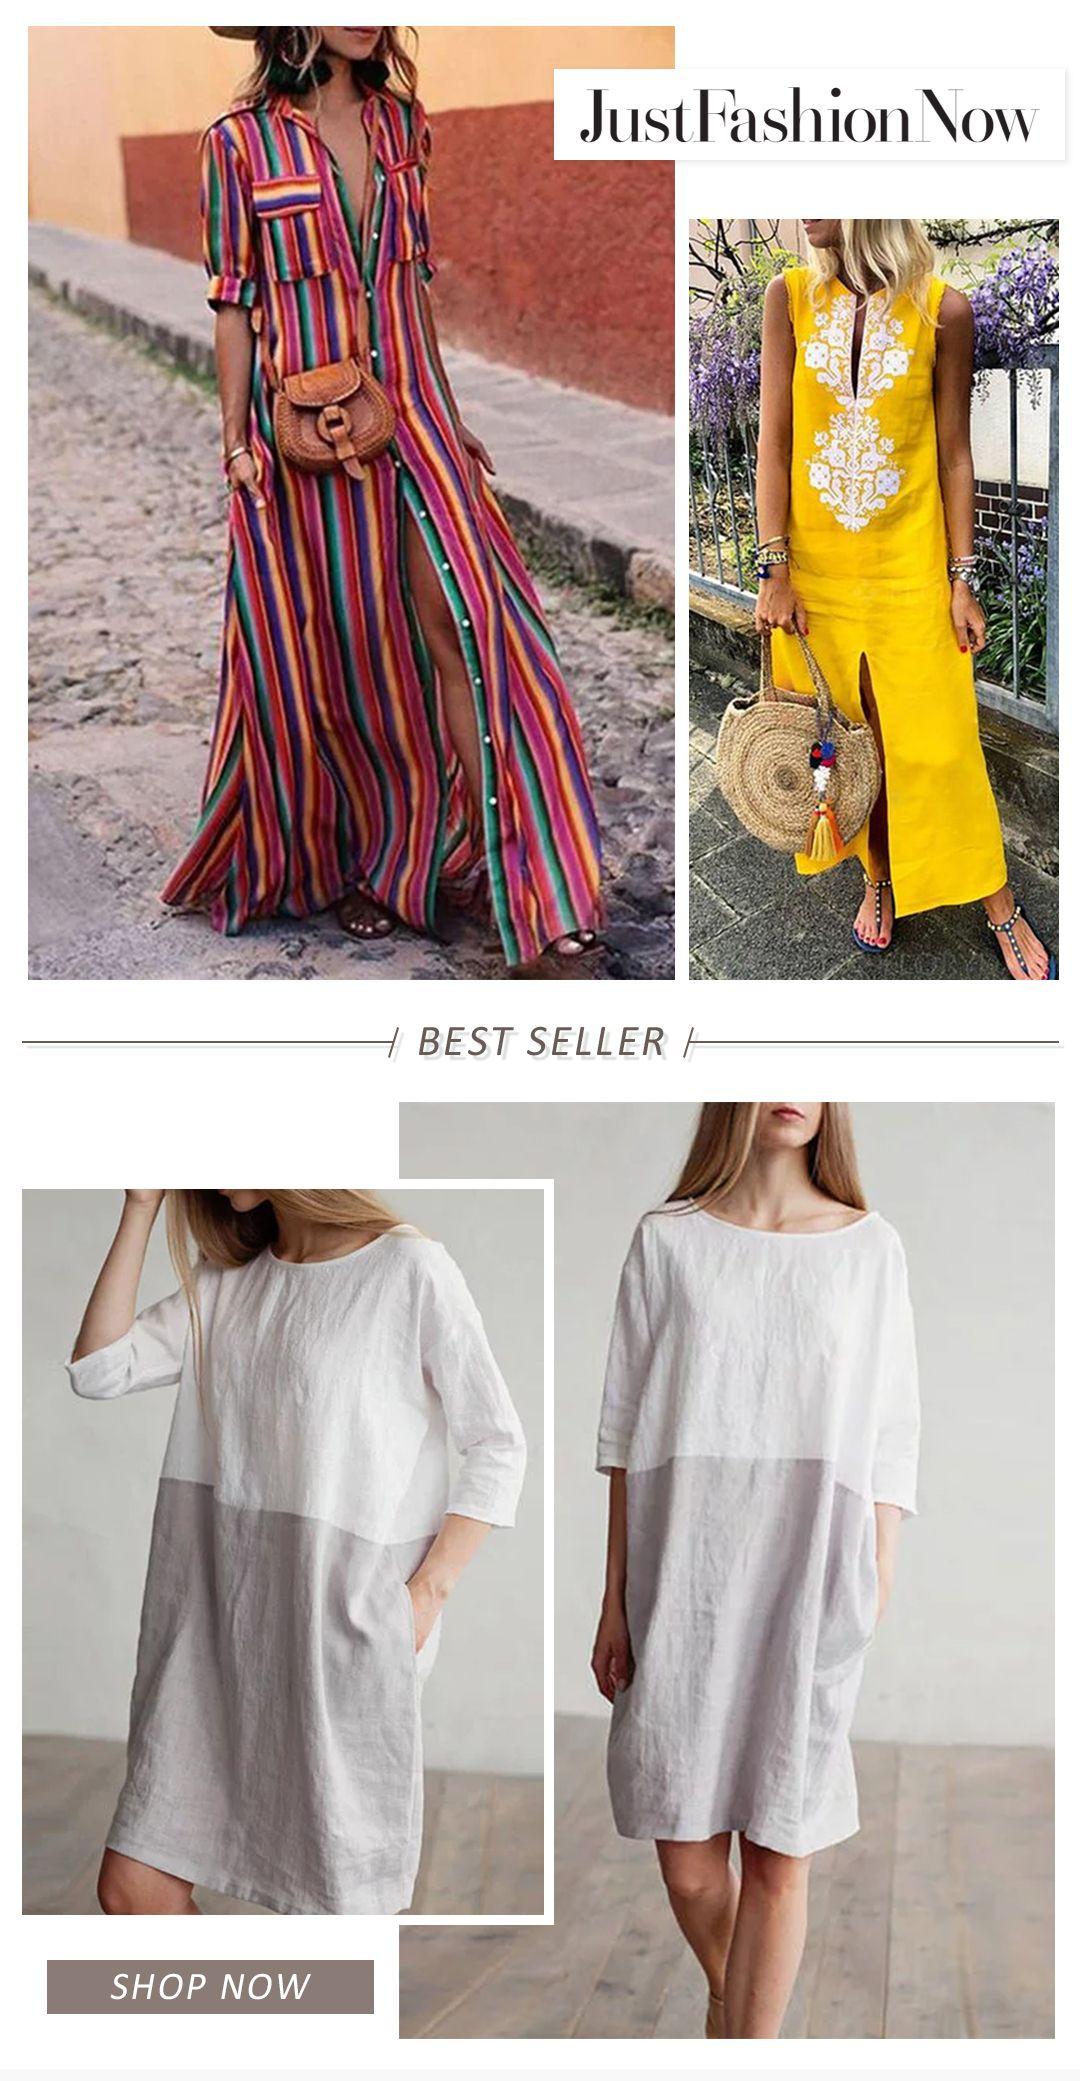 Most Stylish Dresses For 2018 Dresses Summer Dress Back To School Mini Dresses Casual Dress Fashion Latest Fashion Dresses Dresses [ 2081 x 1080 Pixel ]